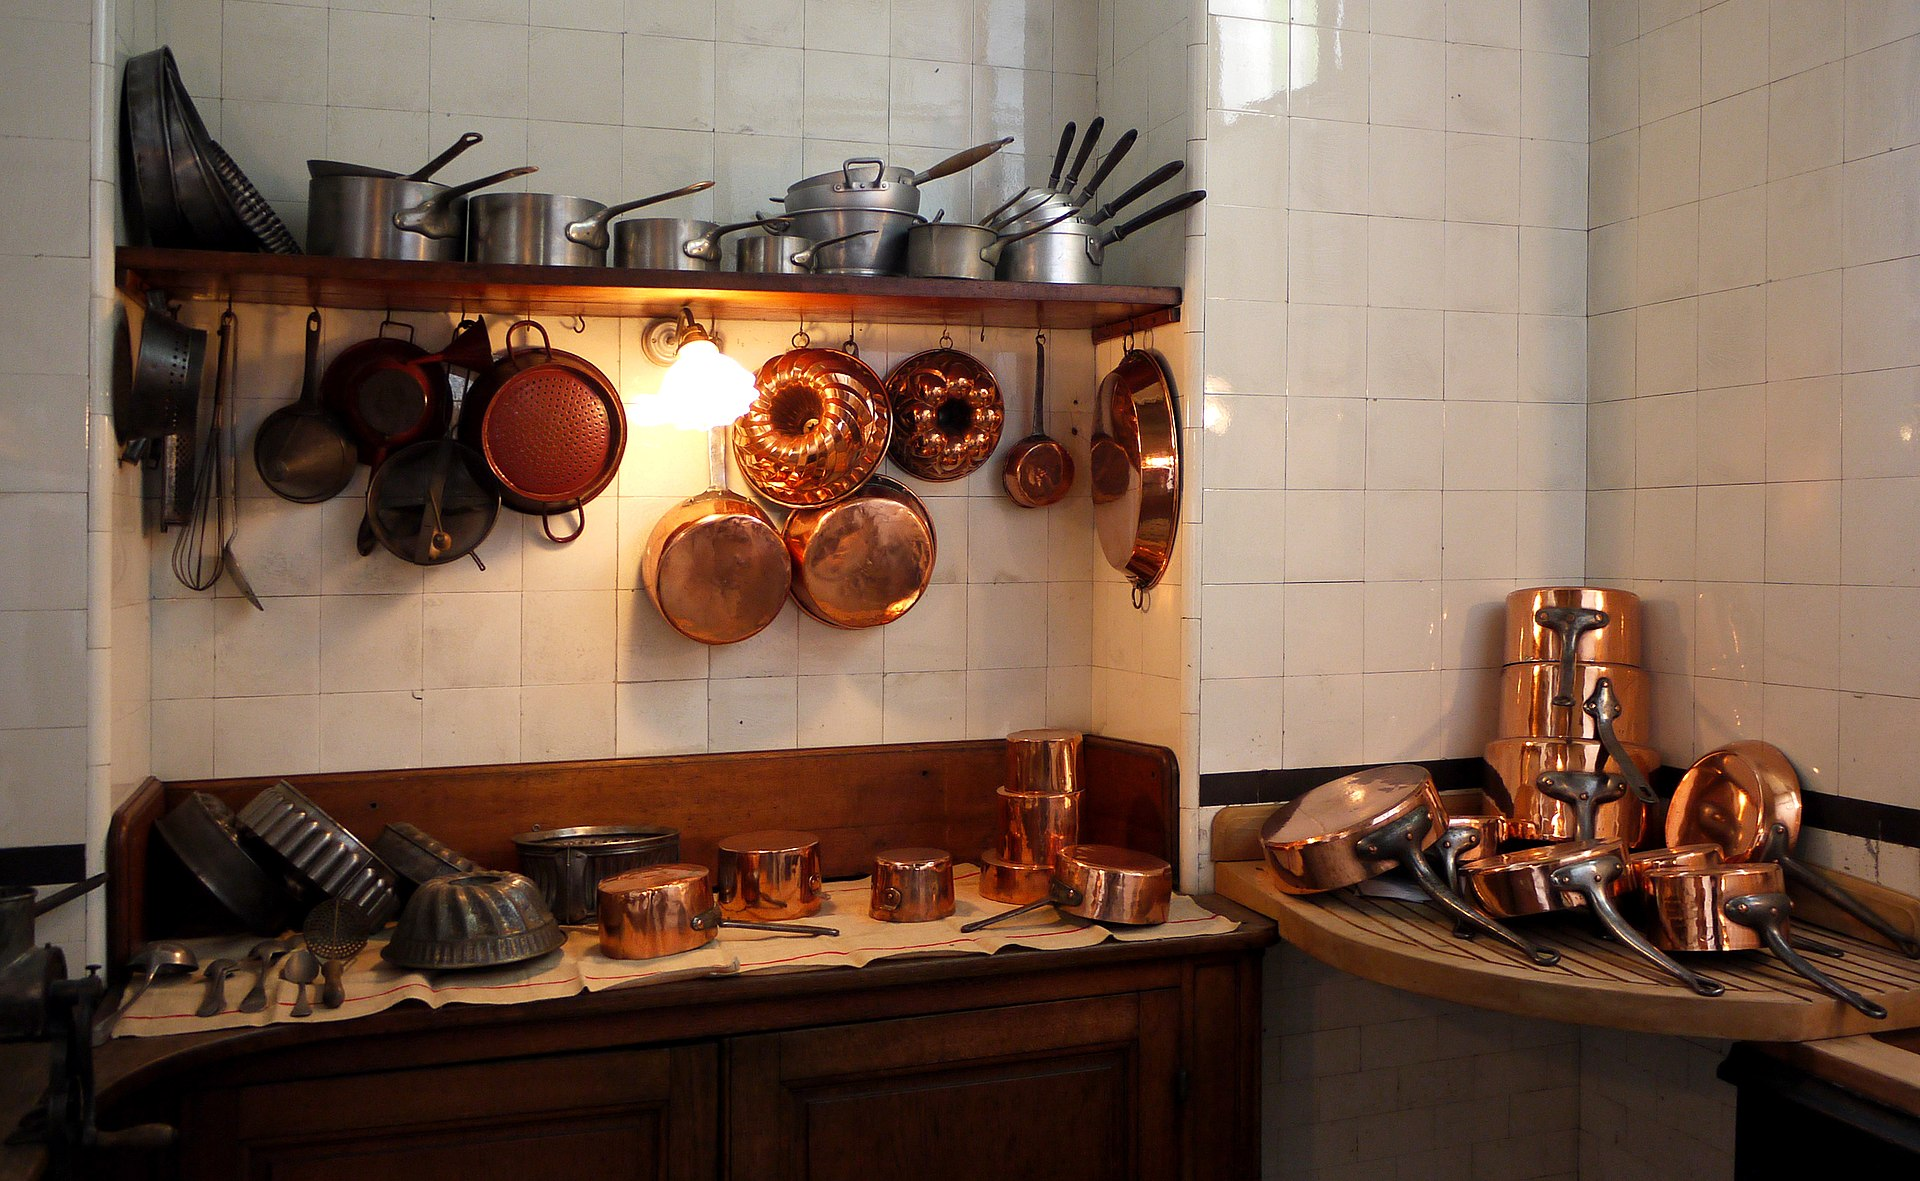 european kitchen gadgets wood tile floor batterie de cuisine wikipedia